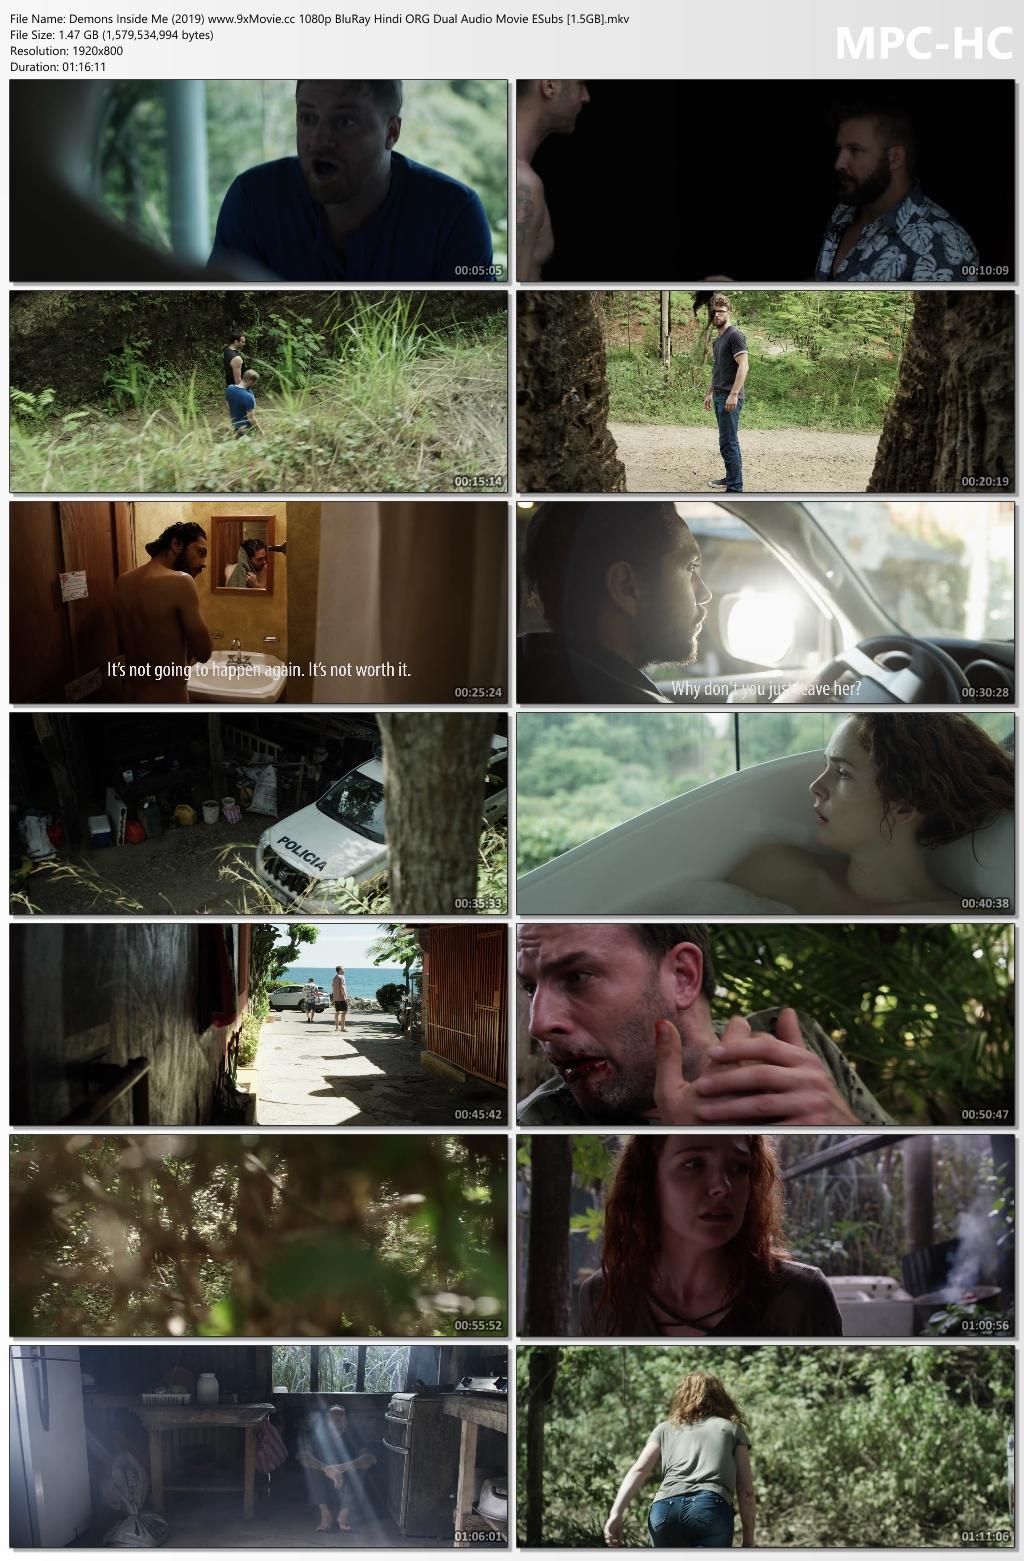 Demons-Inside-Me-2019-www-9x-Movie-cc-1080p-Blu-Ray-Hindi-ORG-Dual-Audio-Movie-ESubs-1-5-GB-mkv